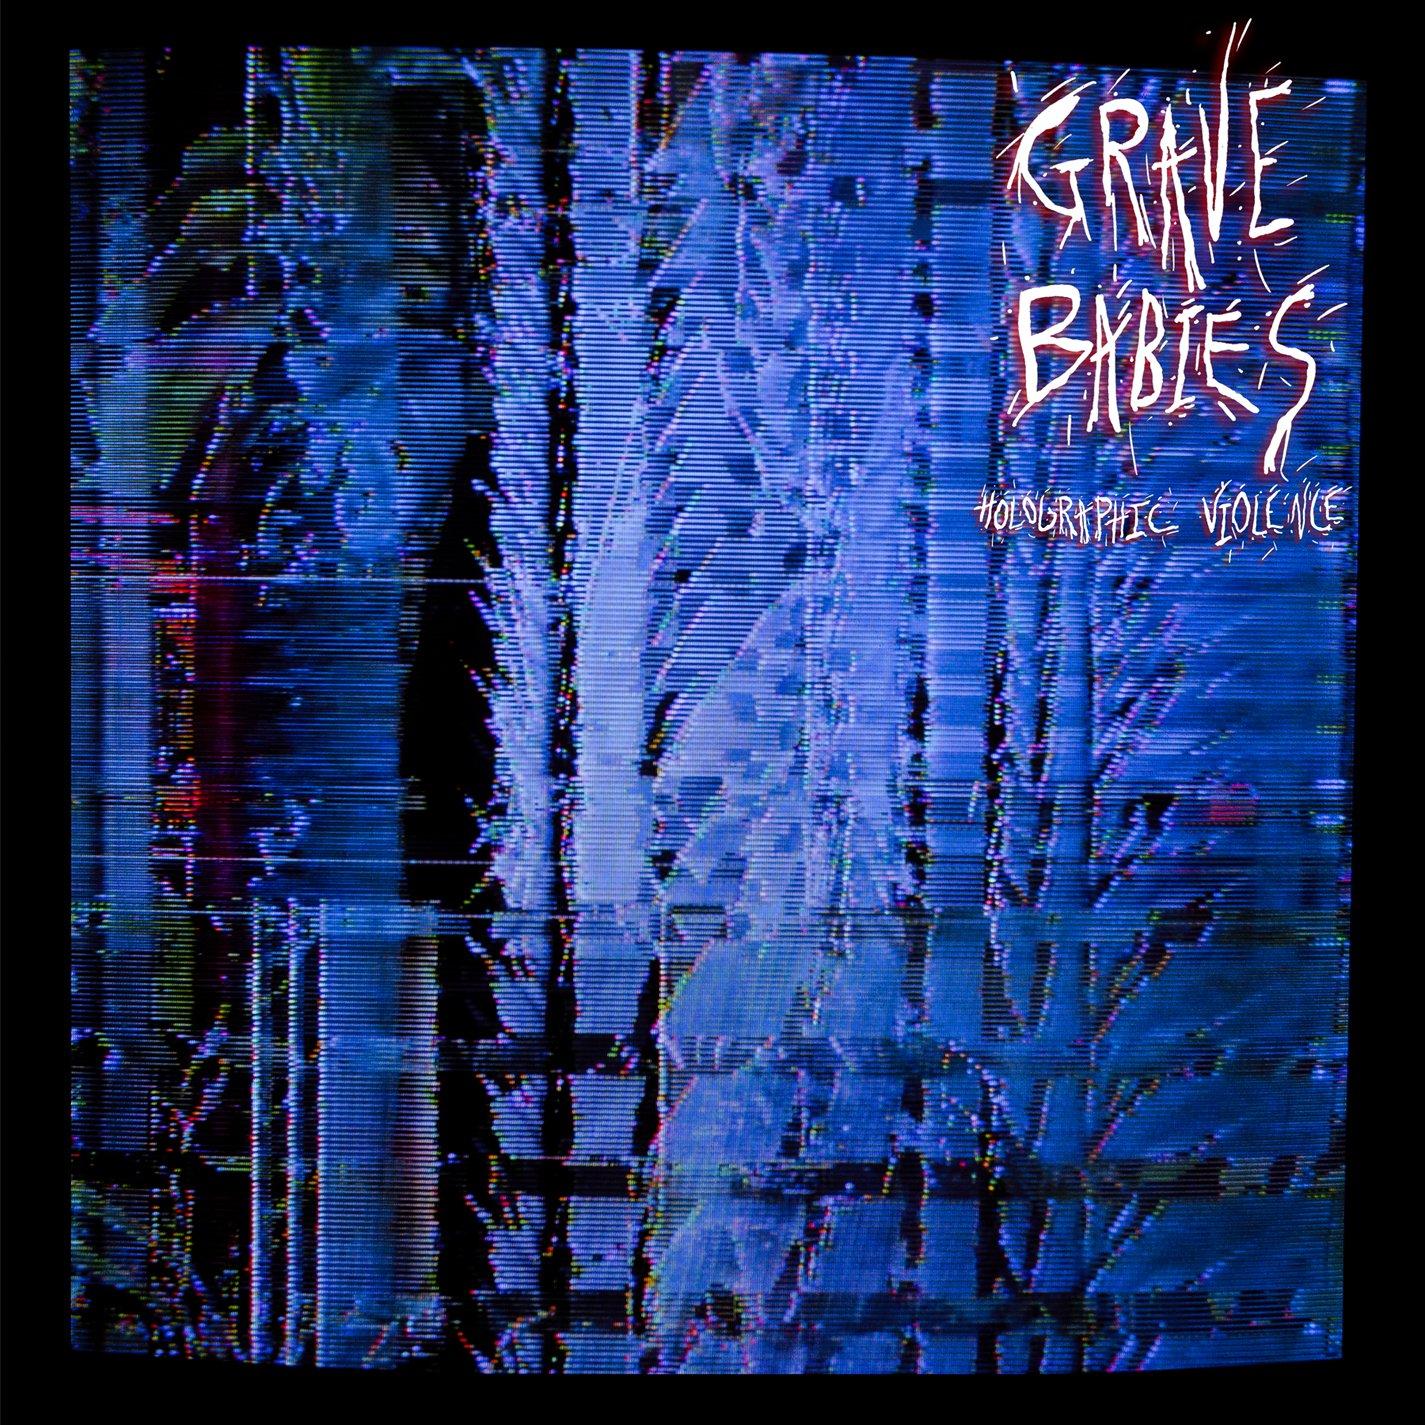 GRAVE BABIES - HOLOGRAPHIC VIOLENCE (DLCD)